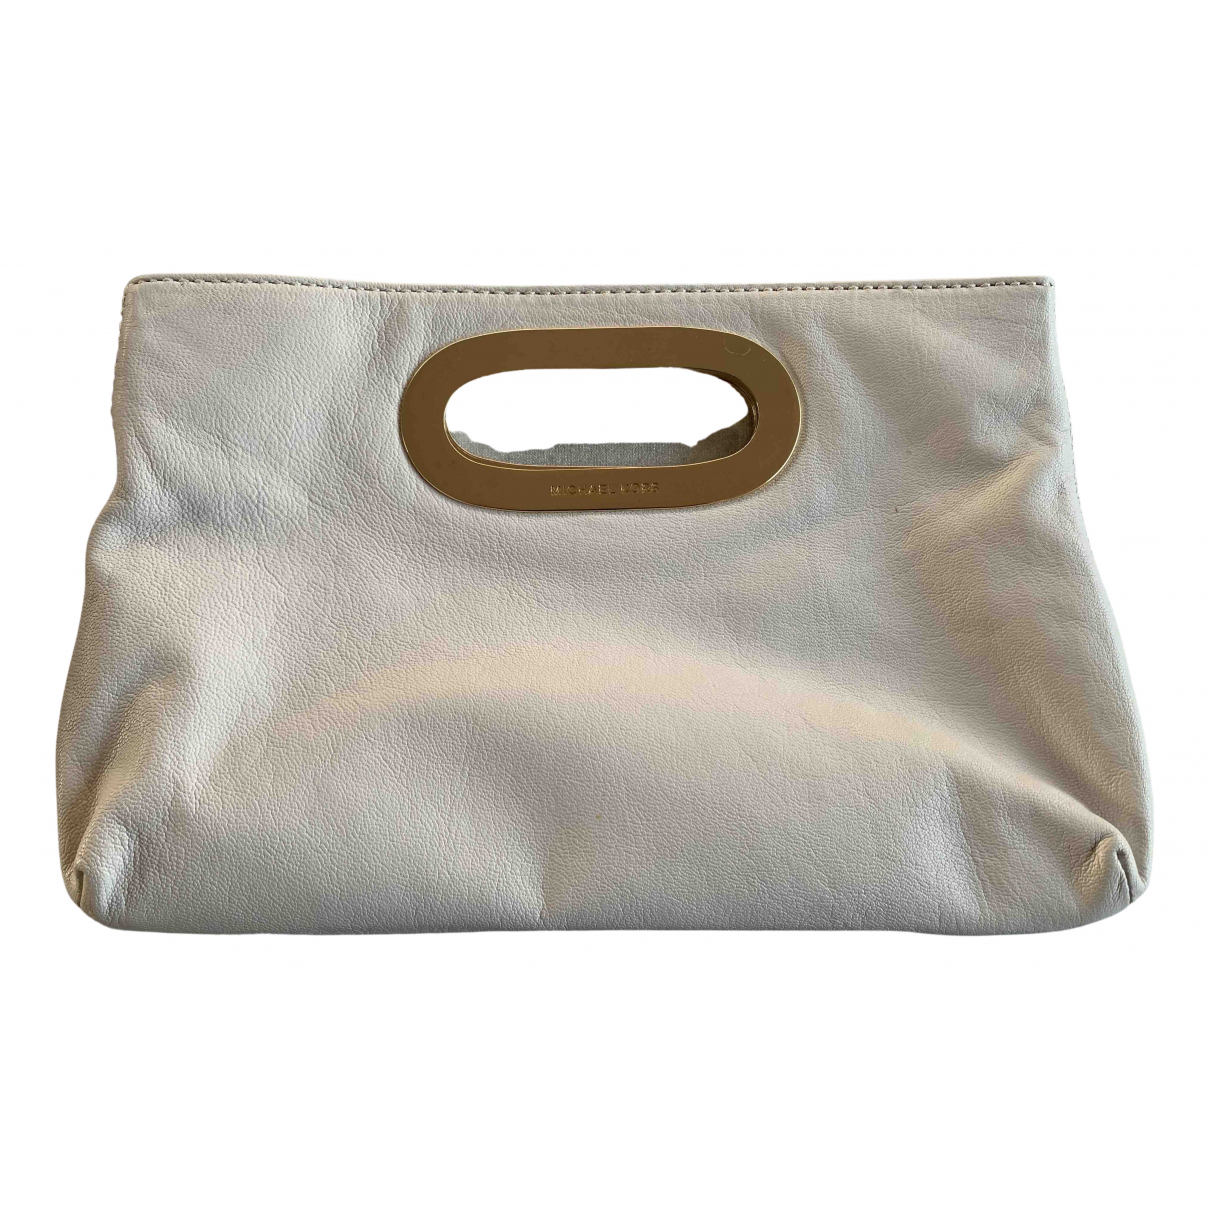 Michael Kors N White Leather Clutch bag for Women N